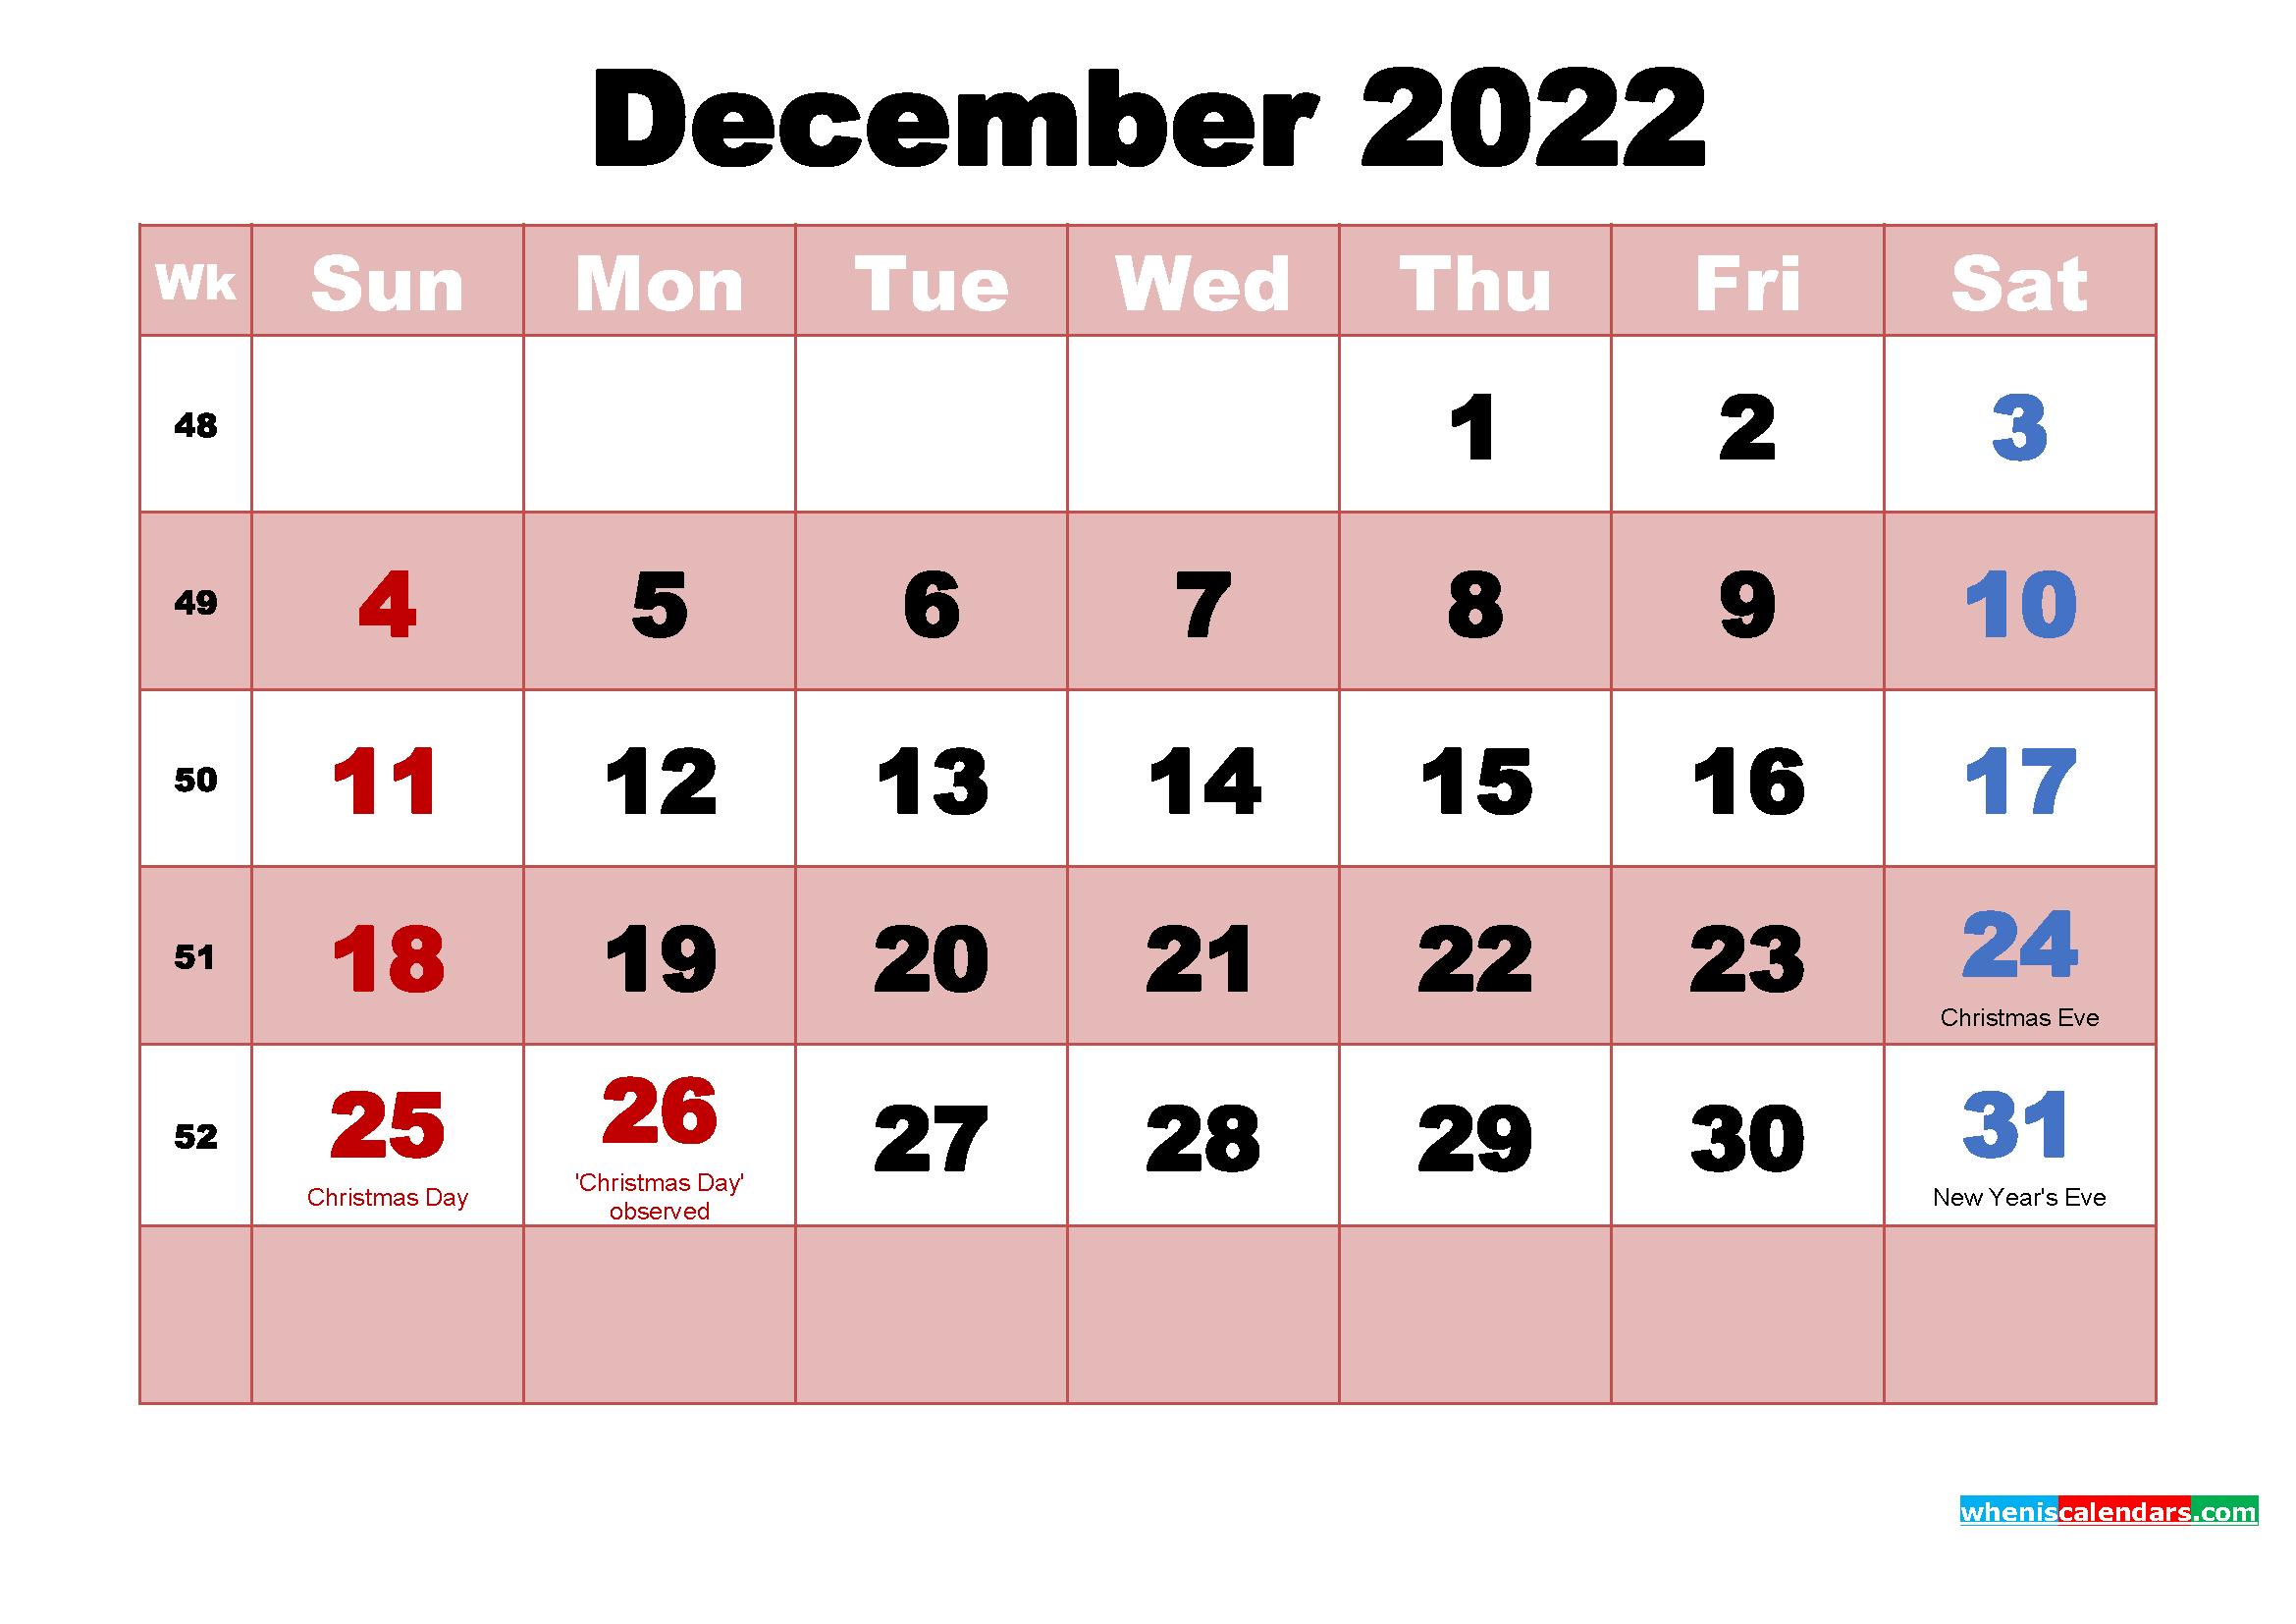 December 2022 Calendar with Holidays Wallpaper